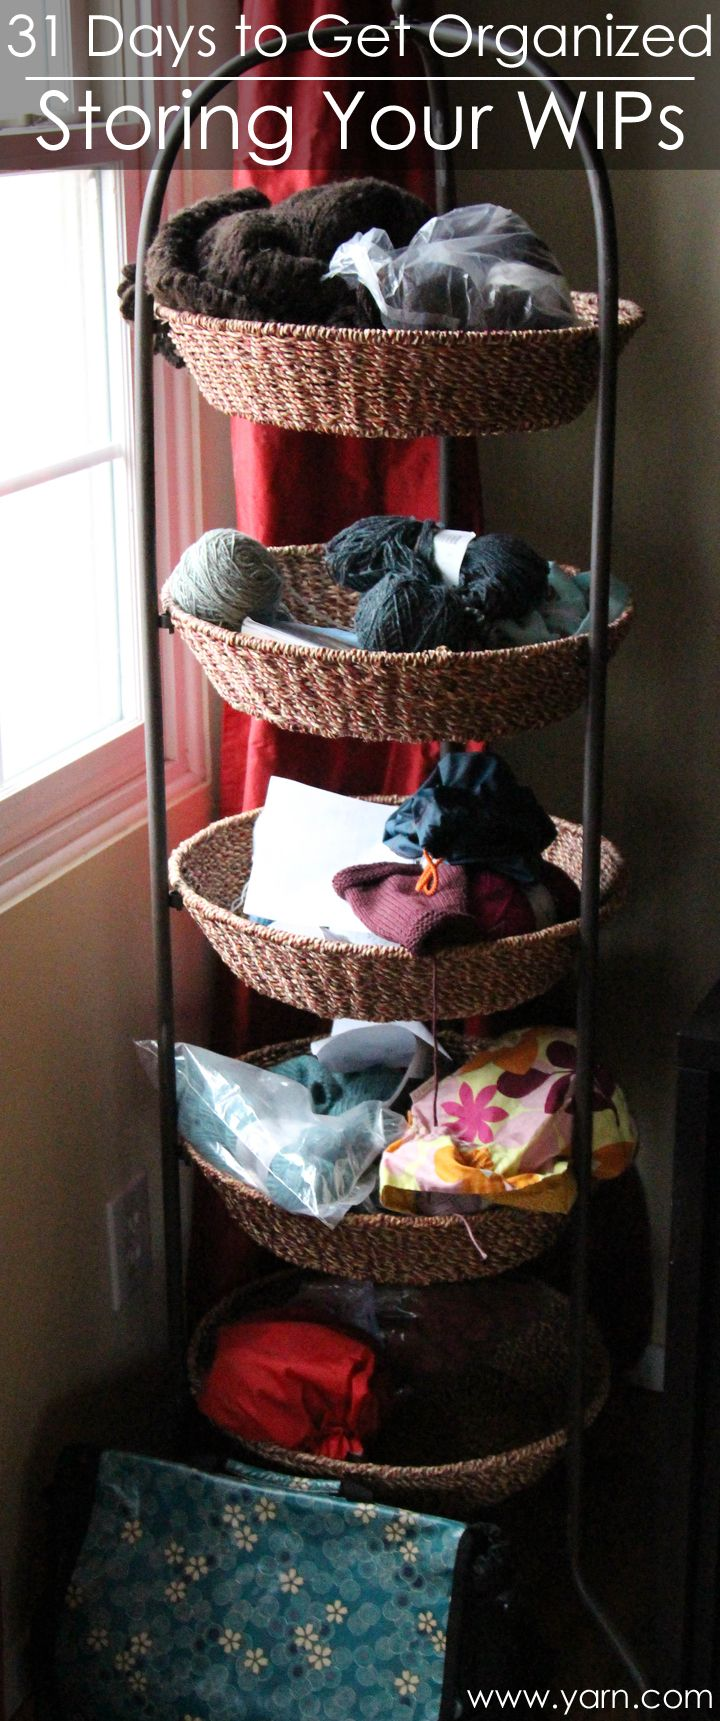 31 Days to Get Organized – Storage ideas for your knitting & crochet works in progress